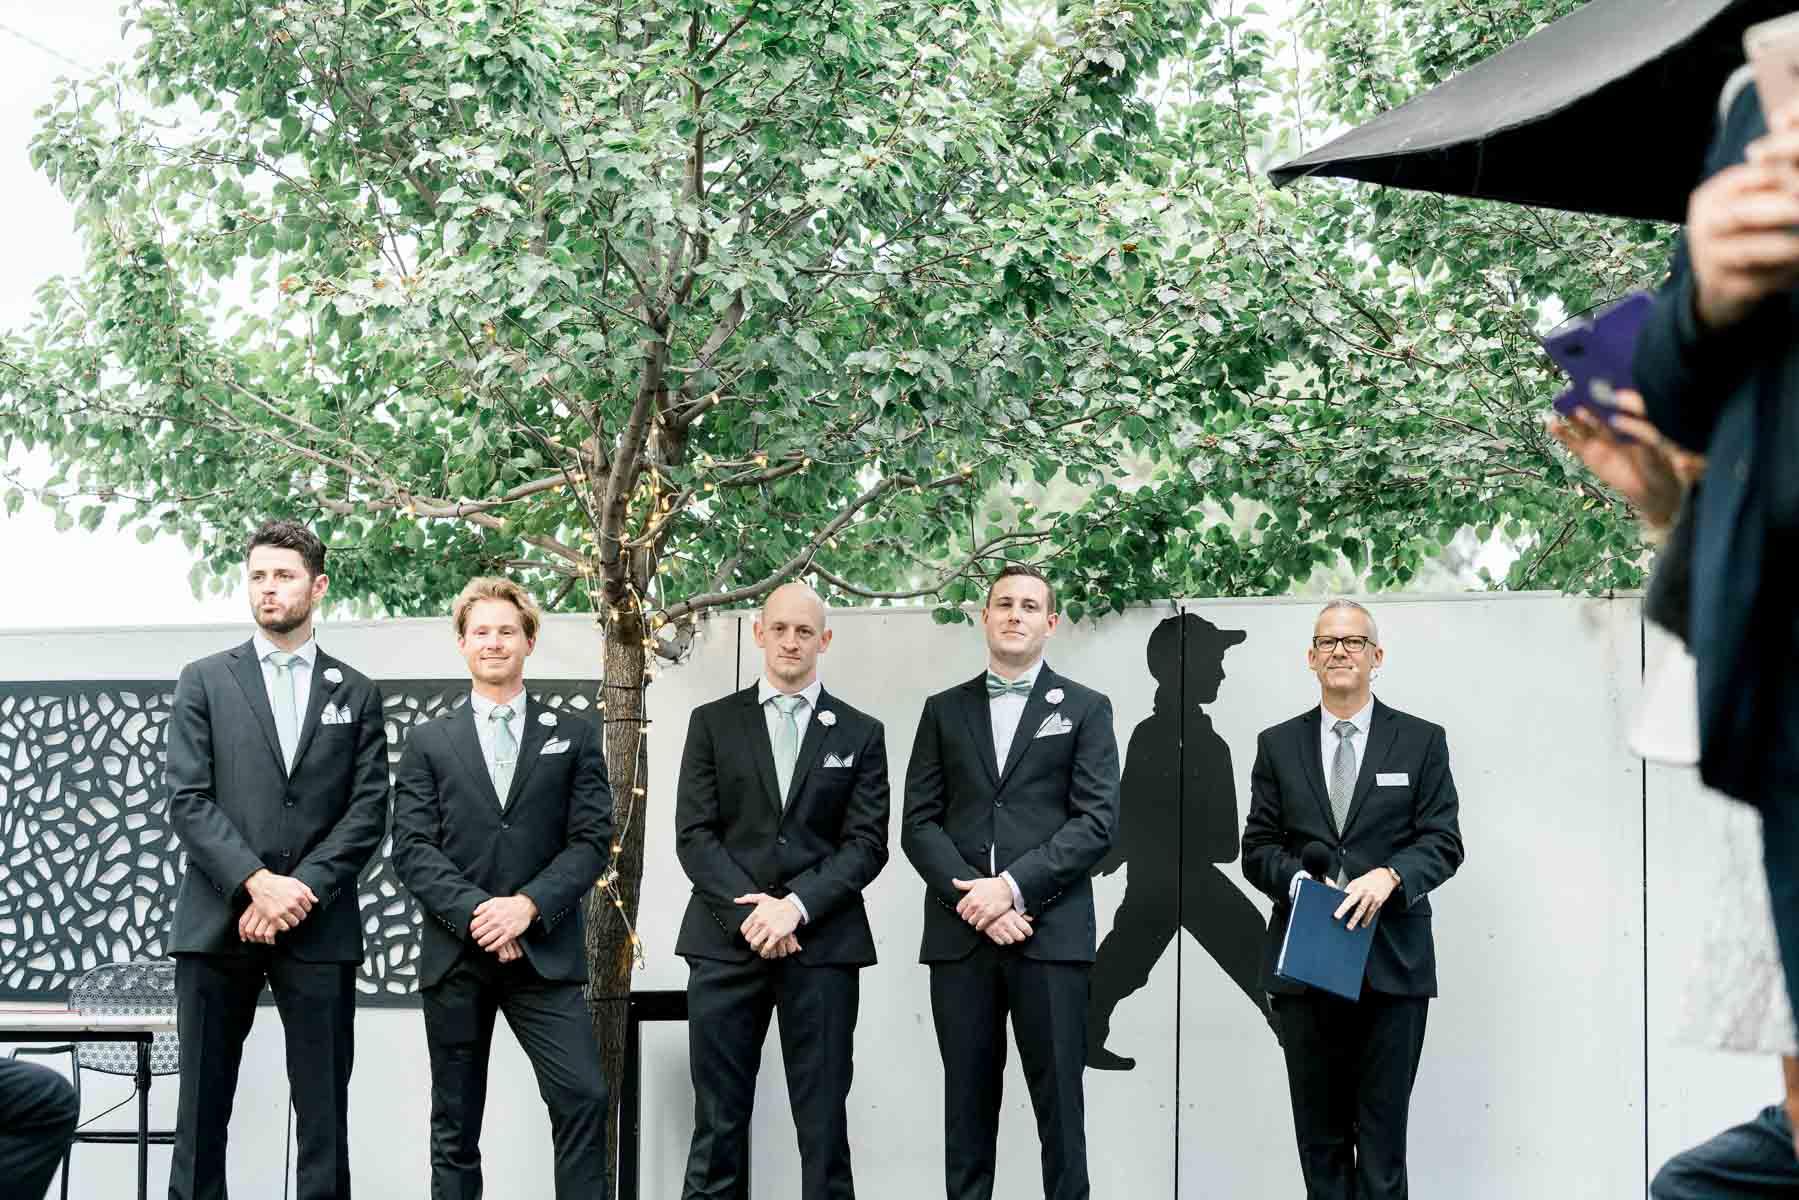 little-henri-cafe-wedding-thornbury-heart+soul-weddings-jane-aaron-05601.jpg